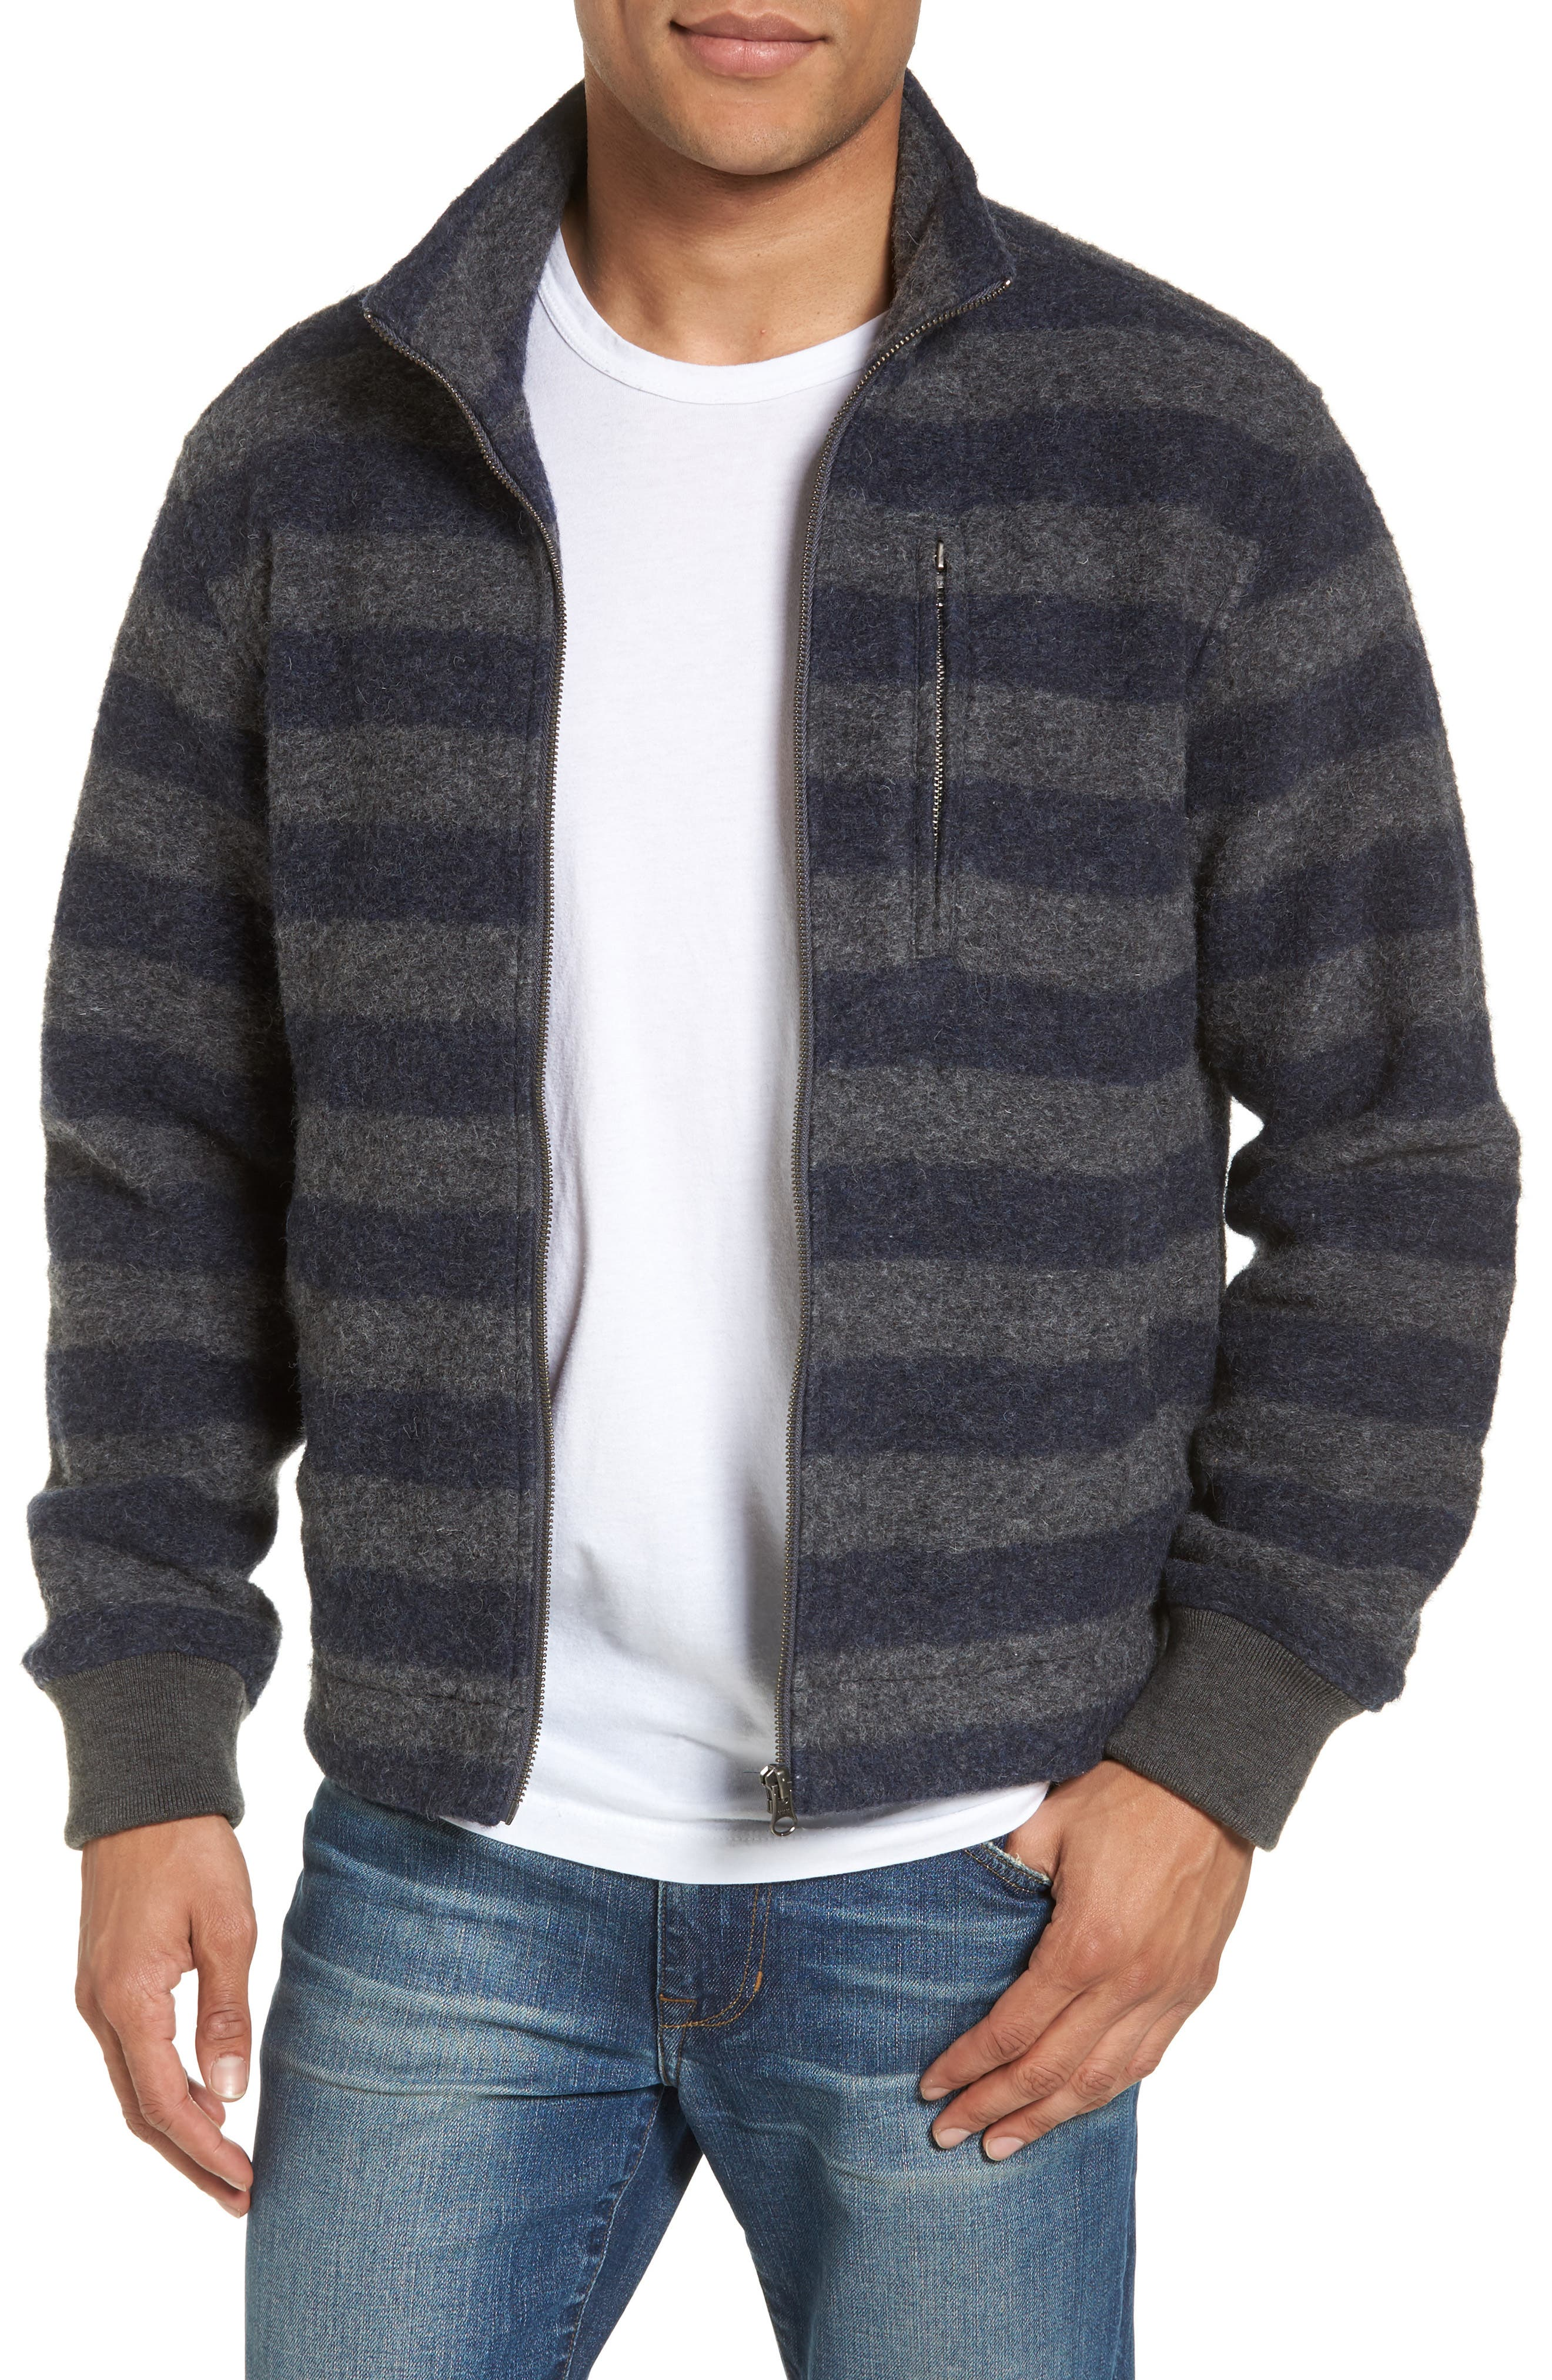 Bowen Stripe Zip Front Jacket,                         Main,                         color, Grey Navy Stripe